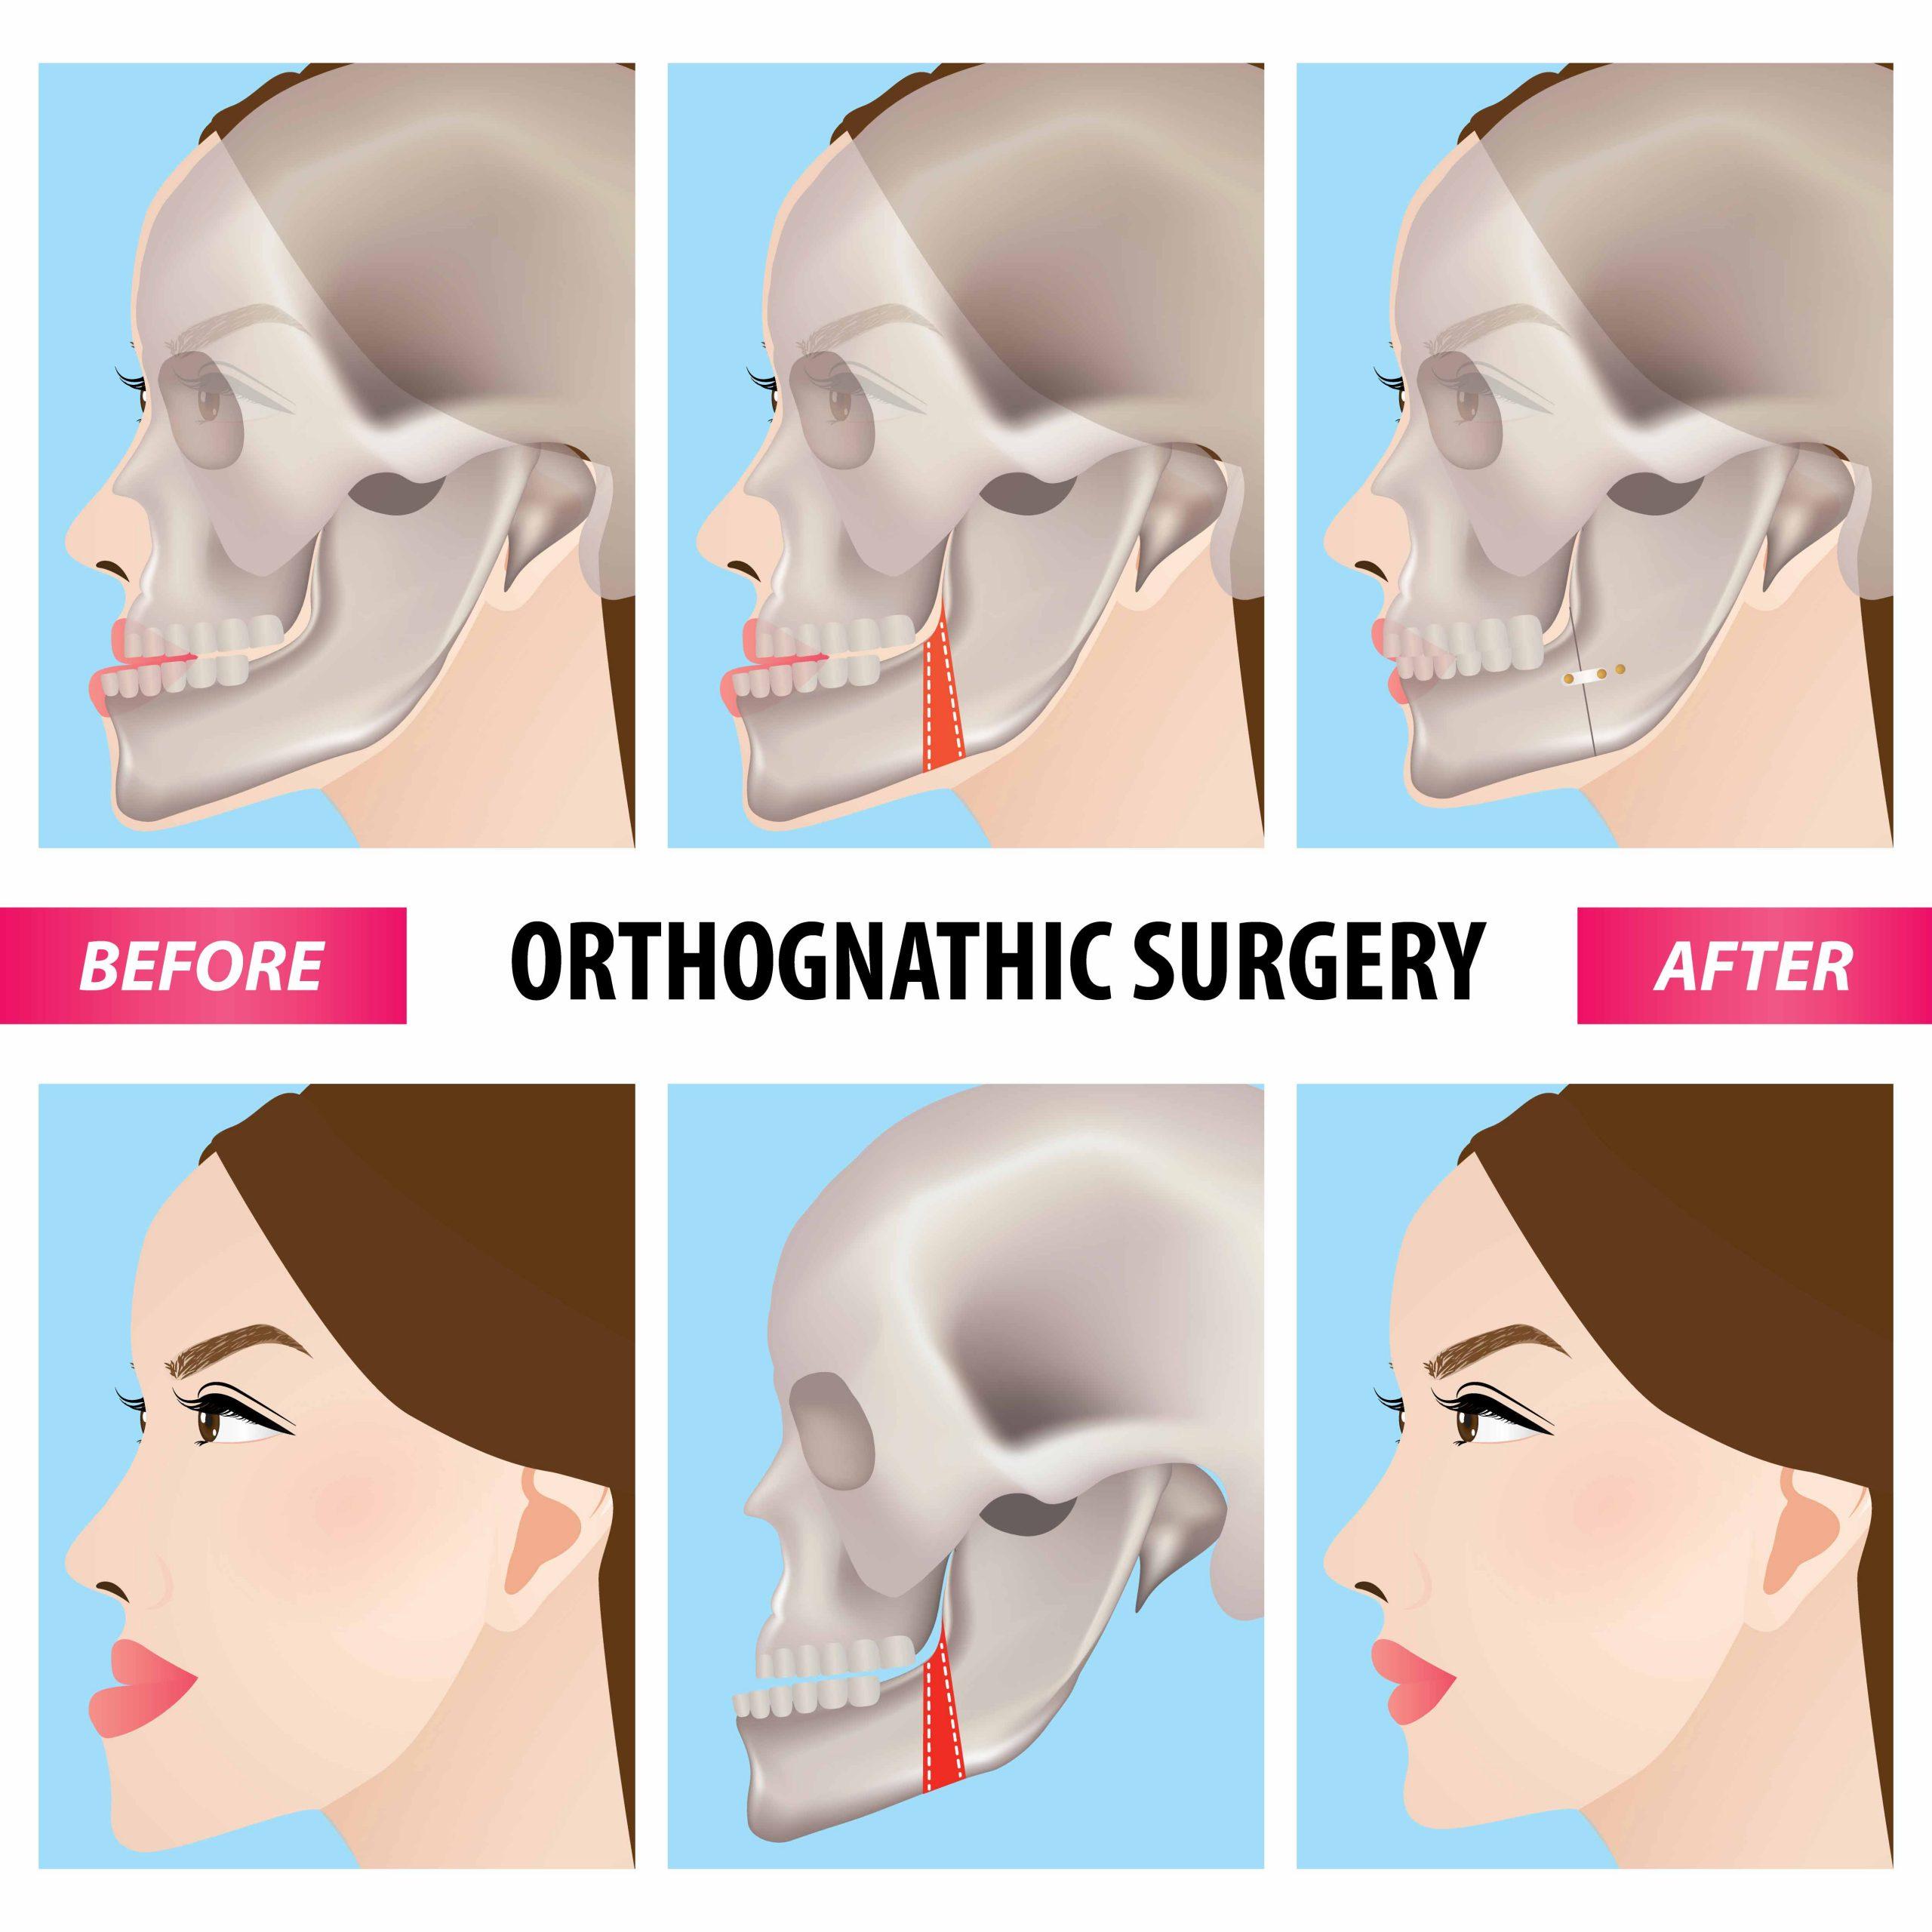 Orthognathic-Surgery-Jaw-Straightening-1